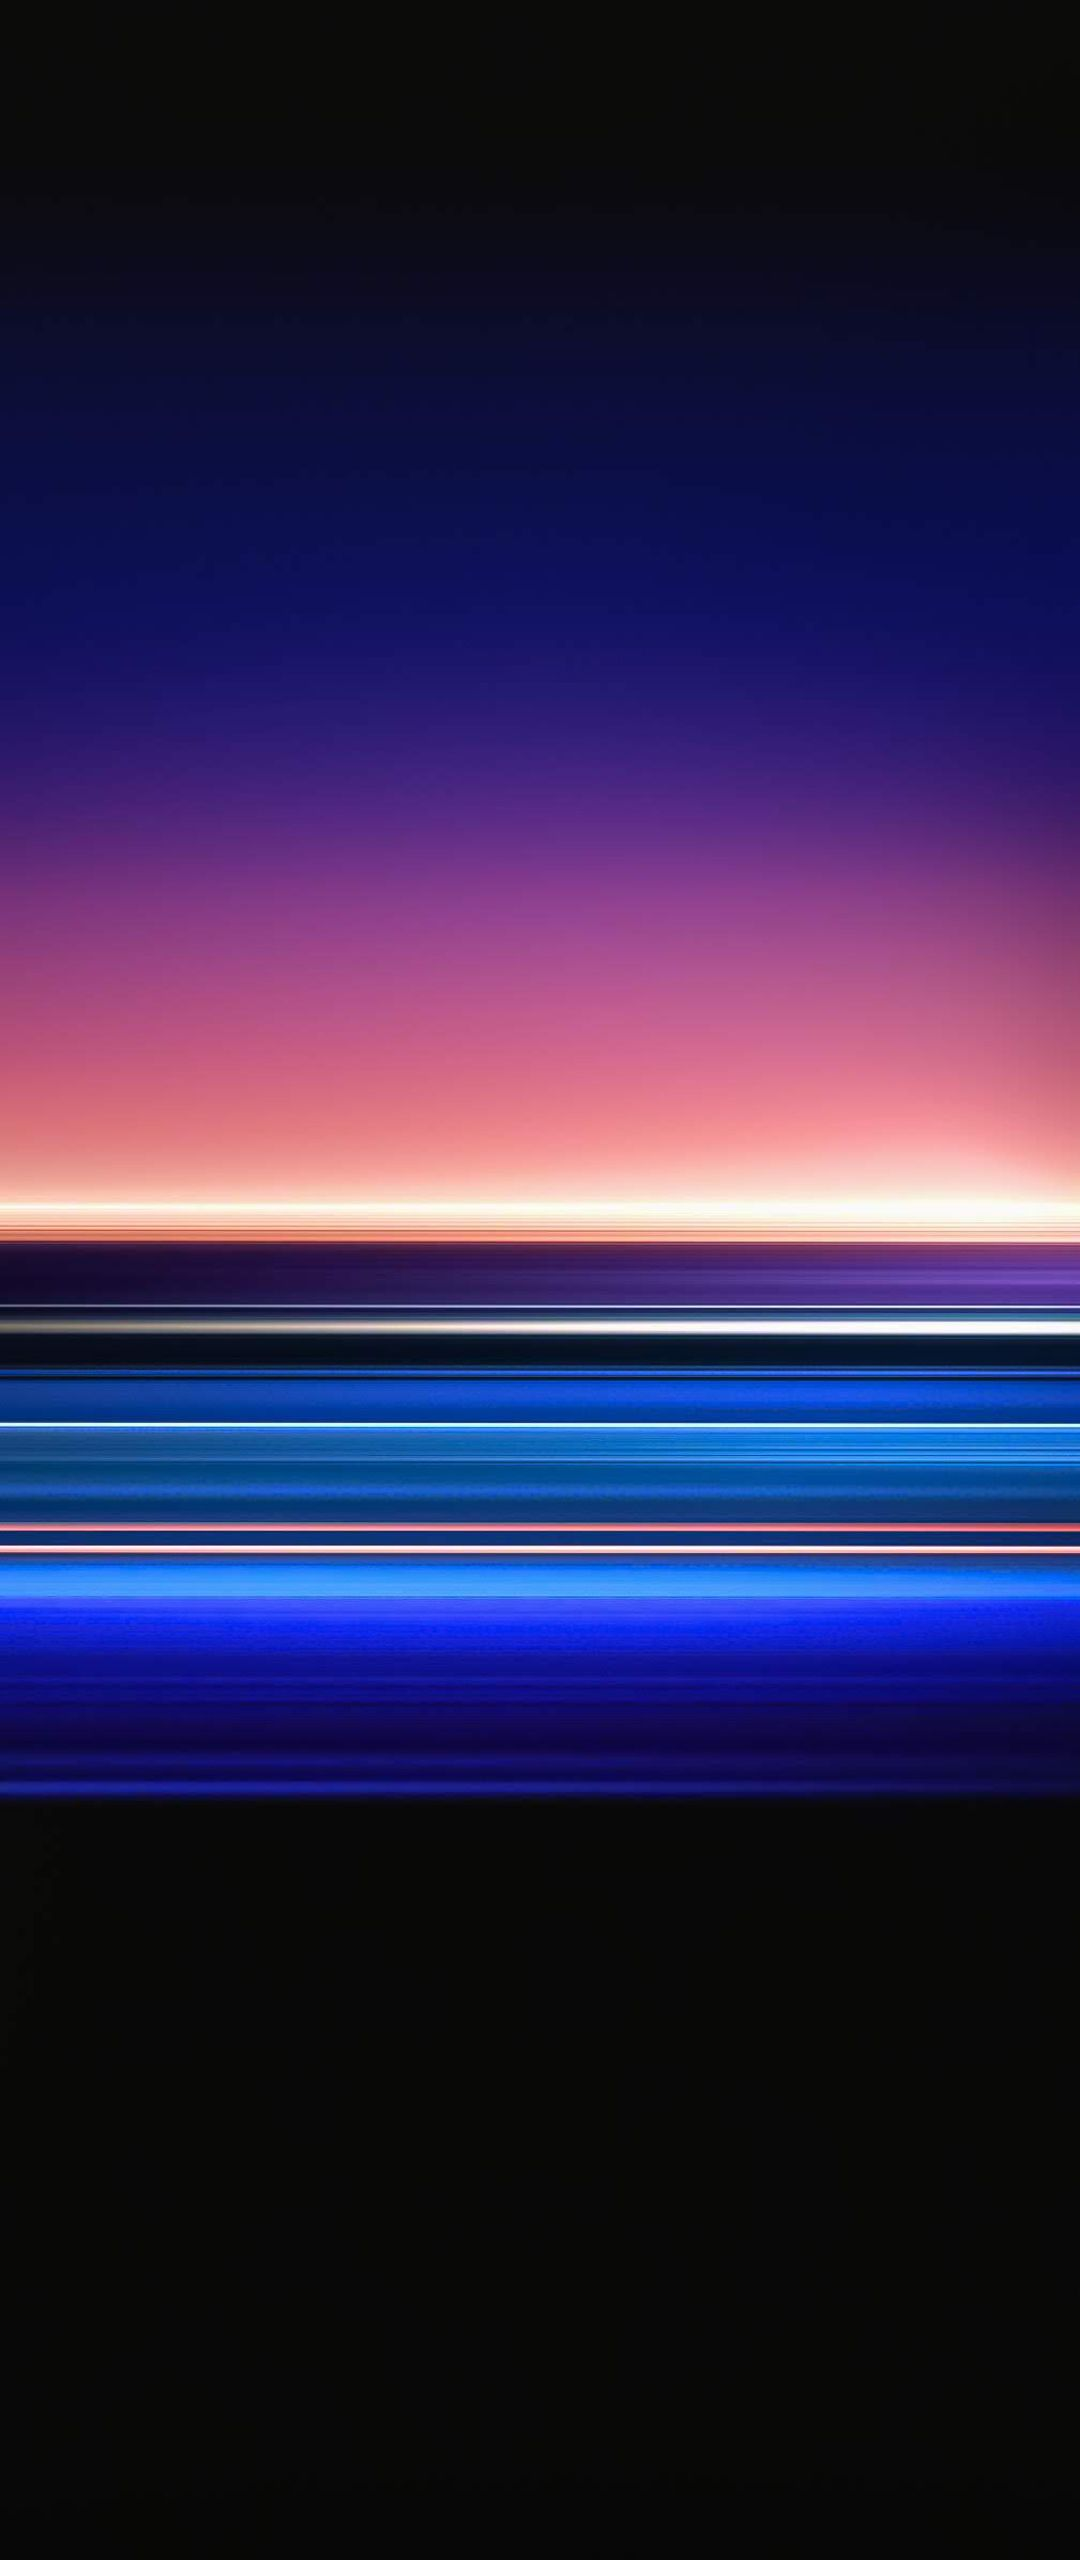 Sony Xperia 5 Stock Wallpaper 04 1080x2560